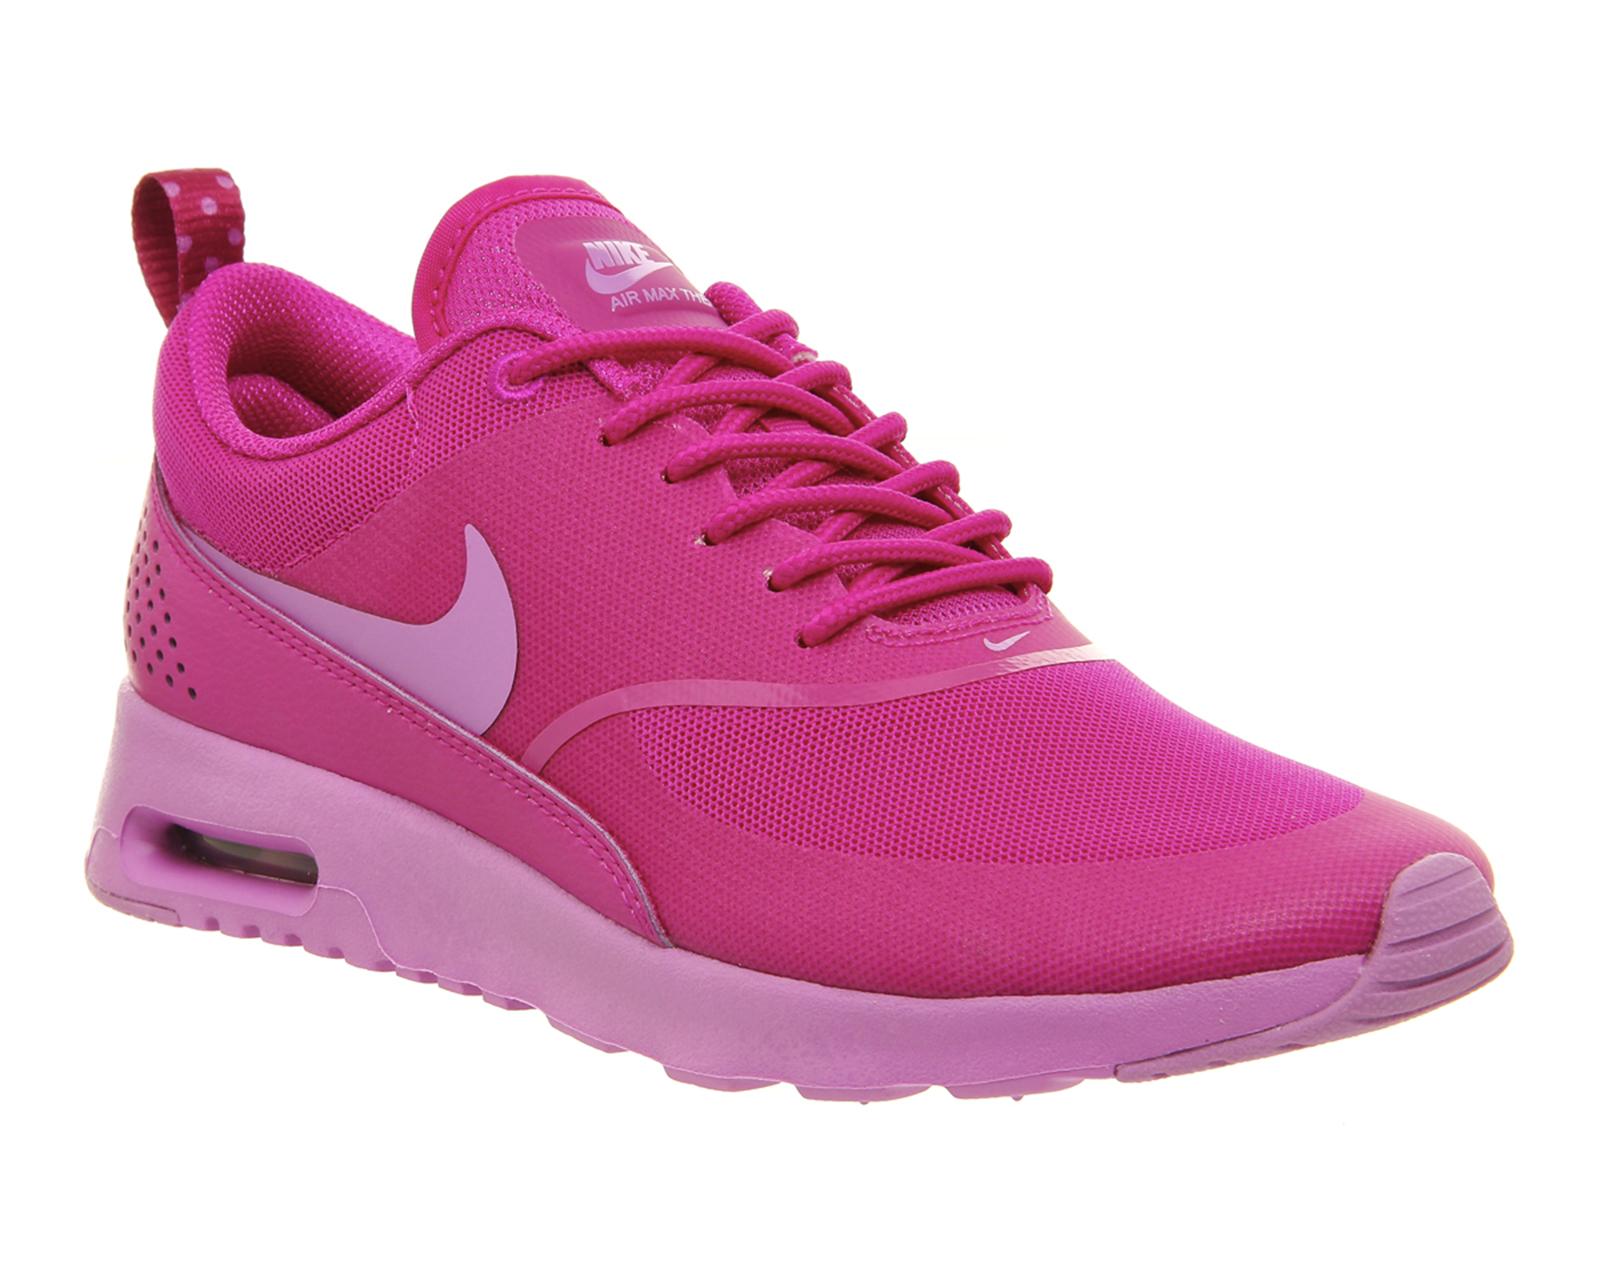 innovative design 7cd95 1f6d6 Nike Air Max Thea in Purple - Lyst